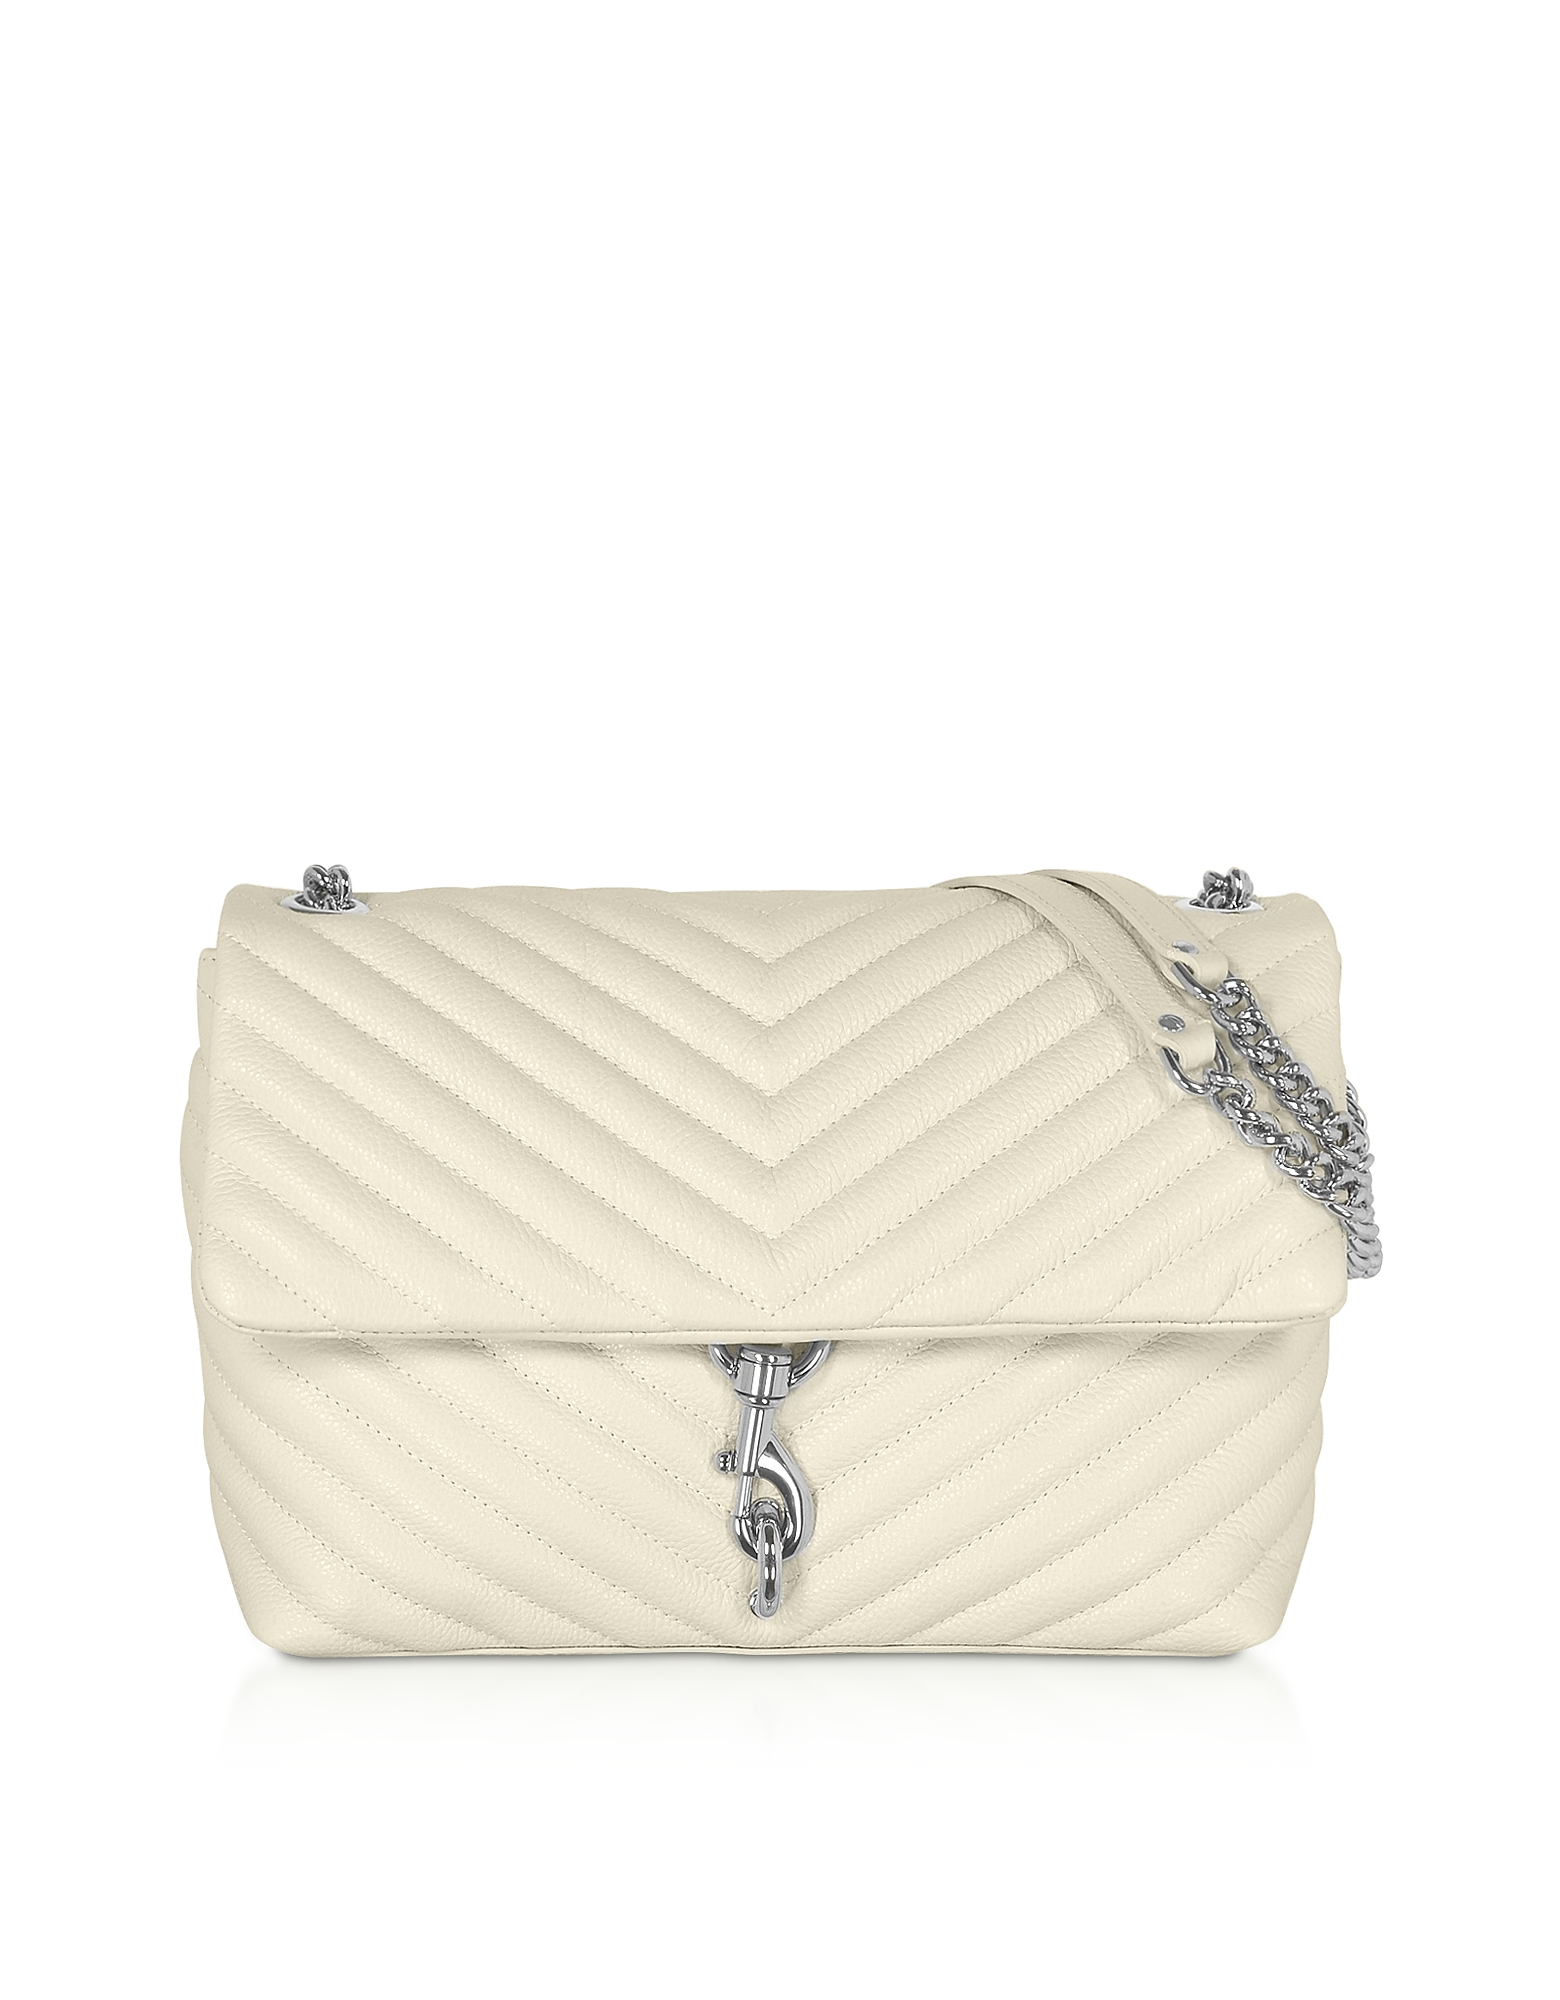 Rebecca Minkoff Designer Handbags, Quilted Leather Edie Flap Shoulder Bag